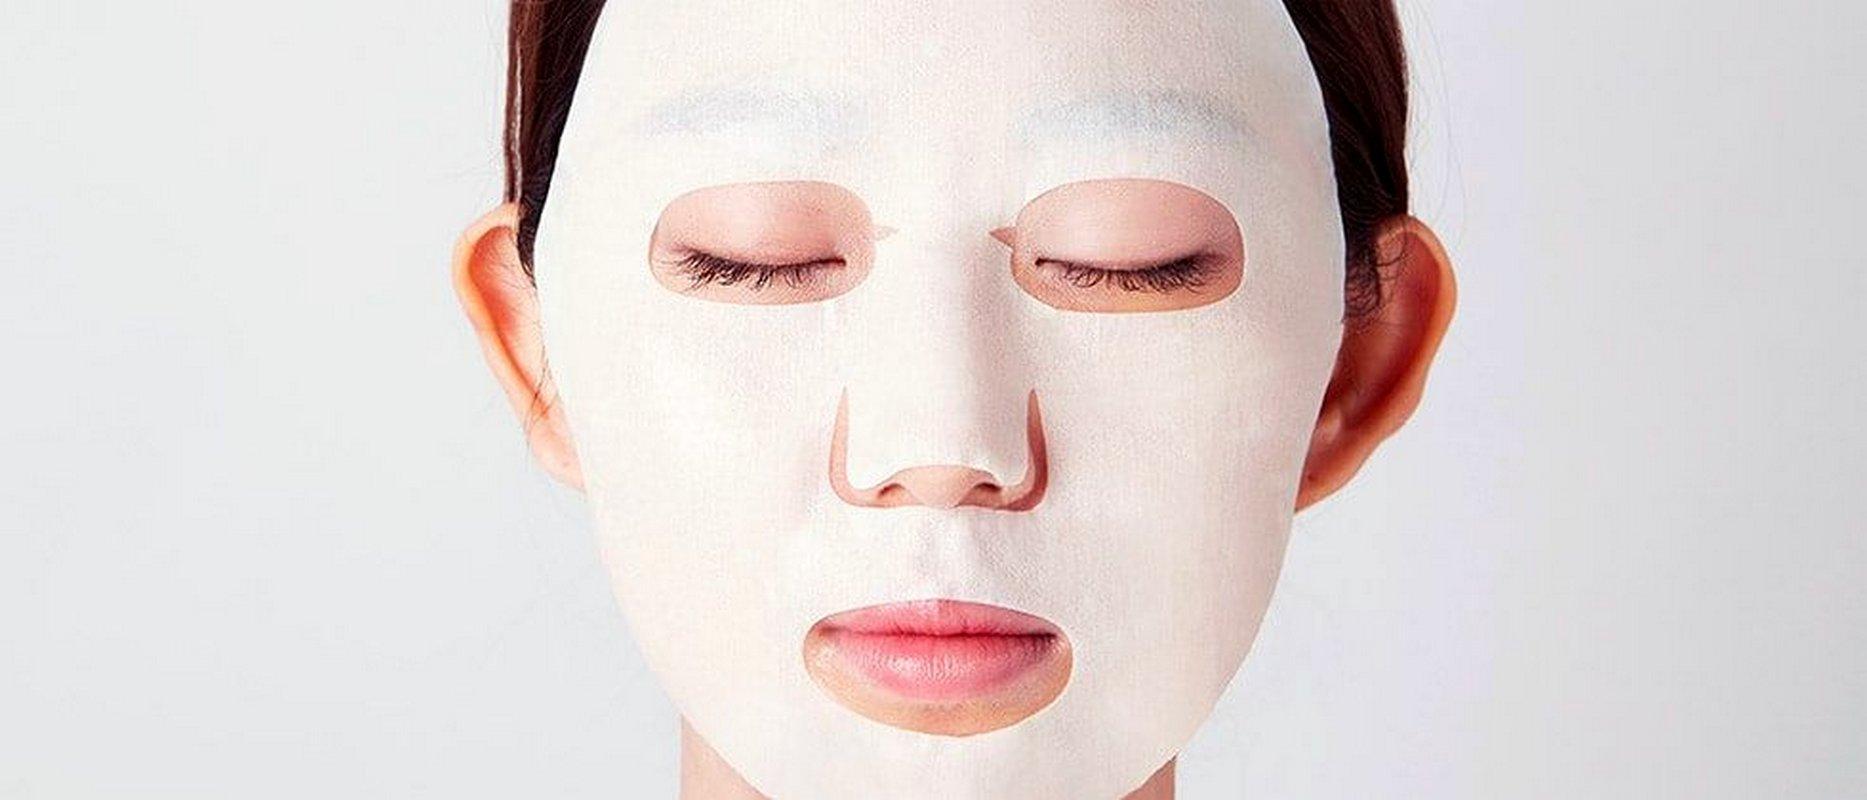 Dr.-Jart-Ceramidin-Facial-Mask